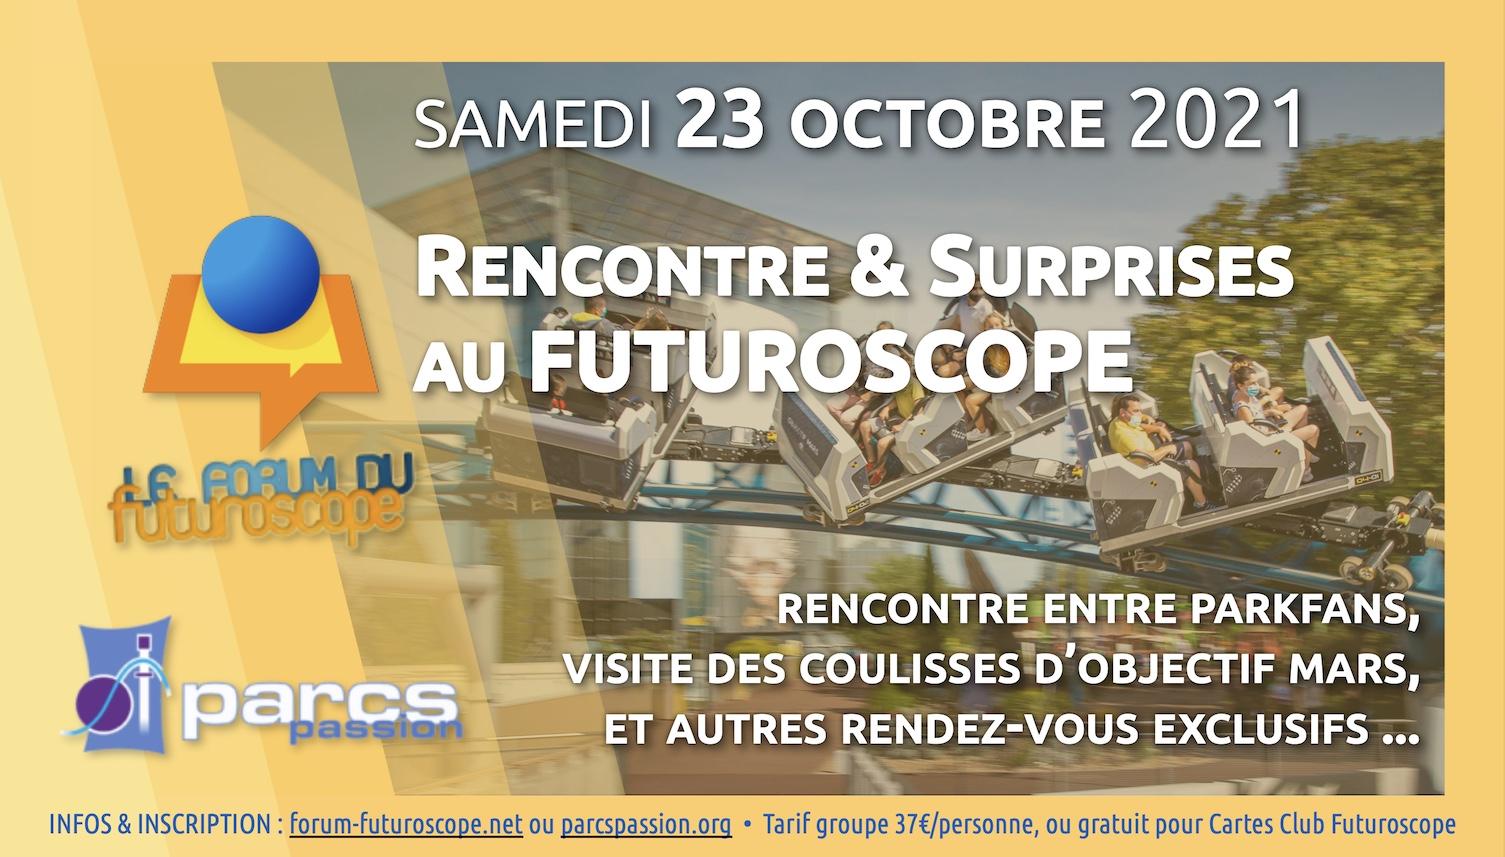 Rencontre Forum du Futuroscope / Parcs Passion · Samedi 23 octobre 2021 Visuel-Journe-e-23-10-2021